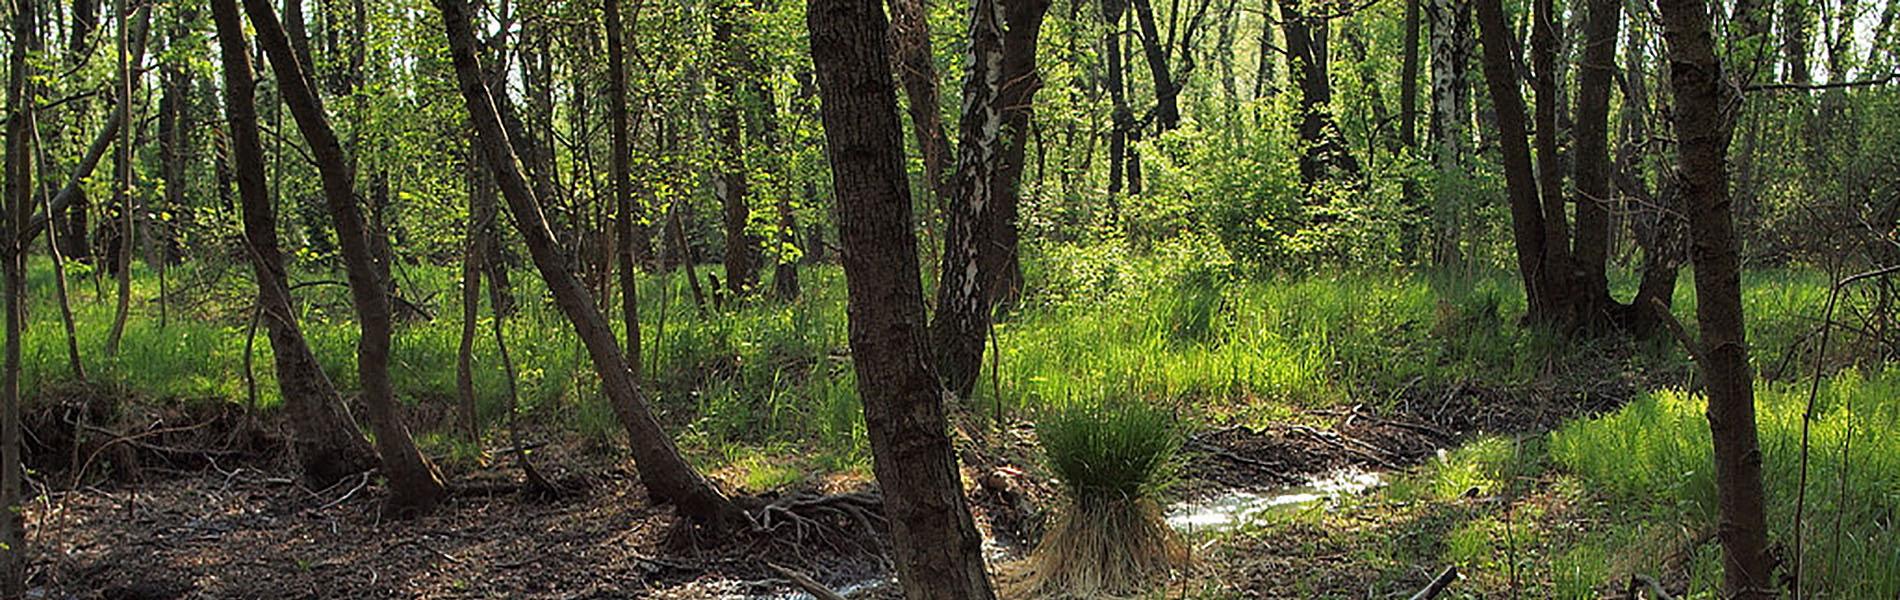 Alluvial alder forests